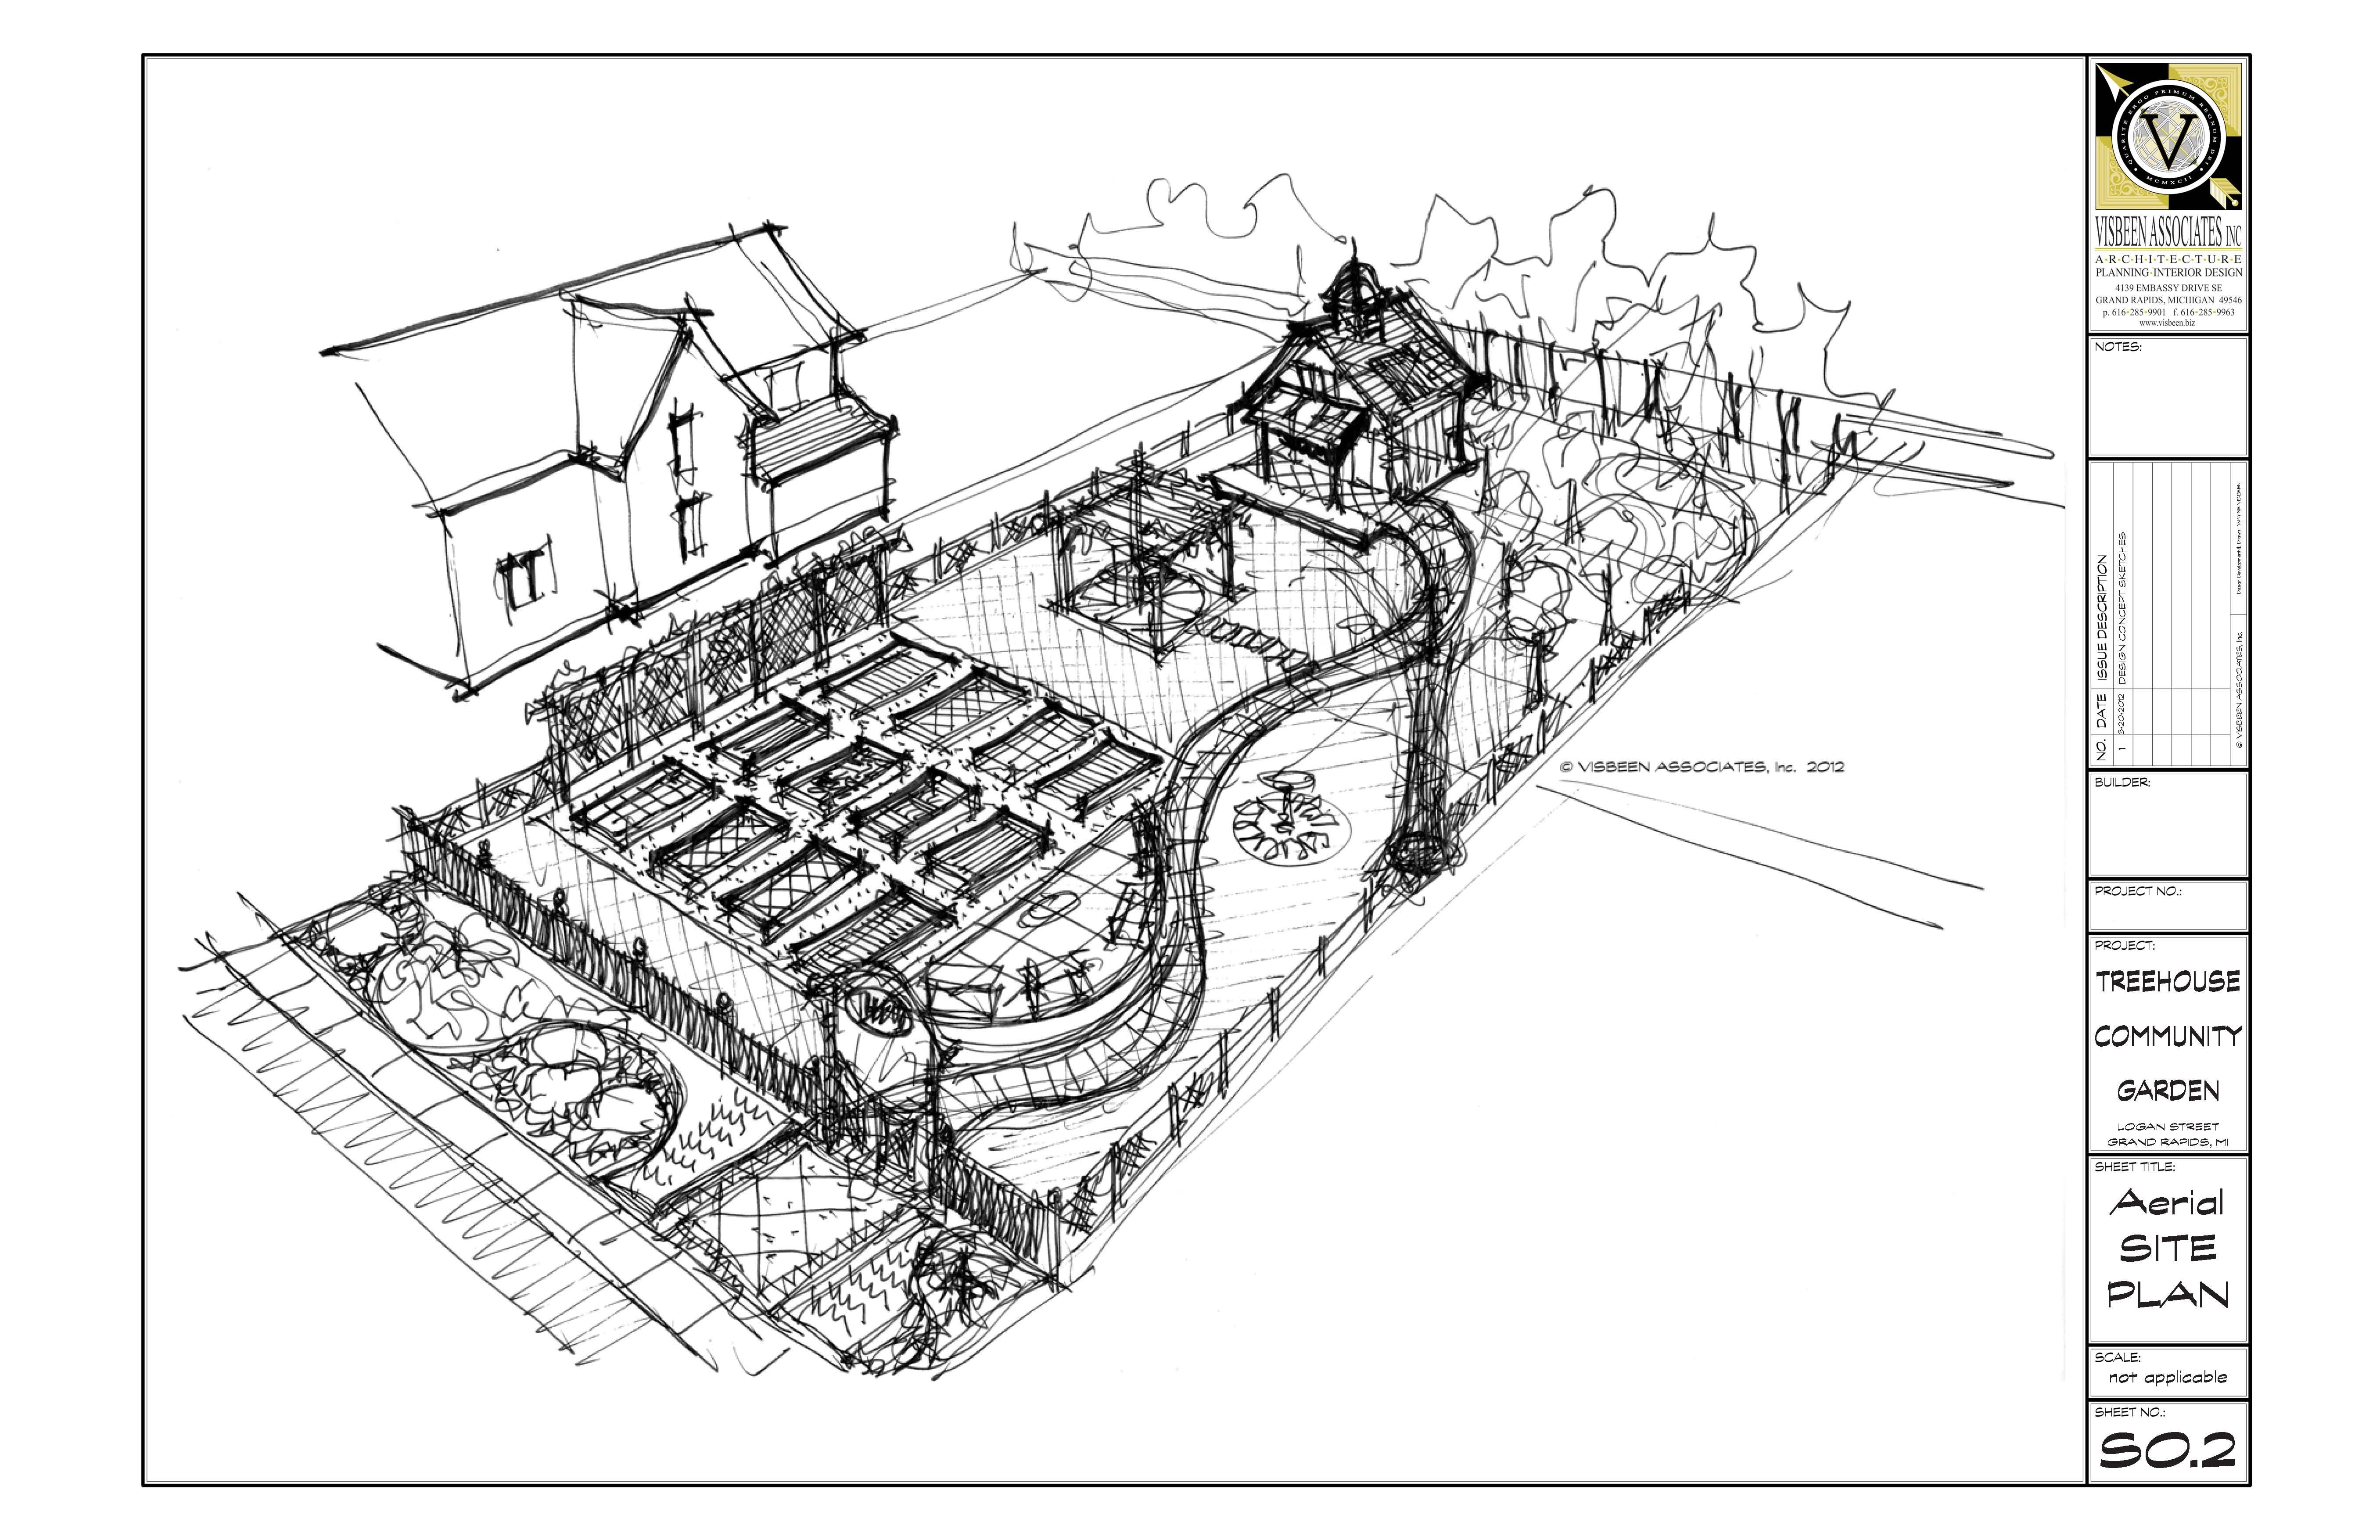 Plans The Treehouse Community Garden